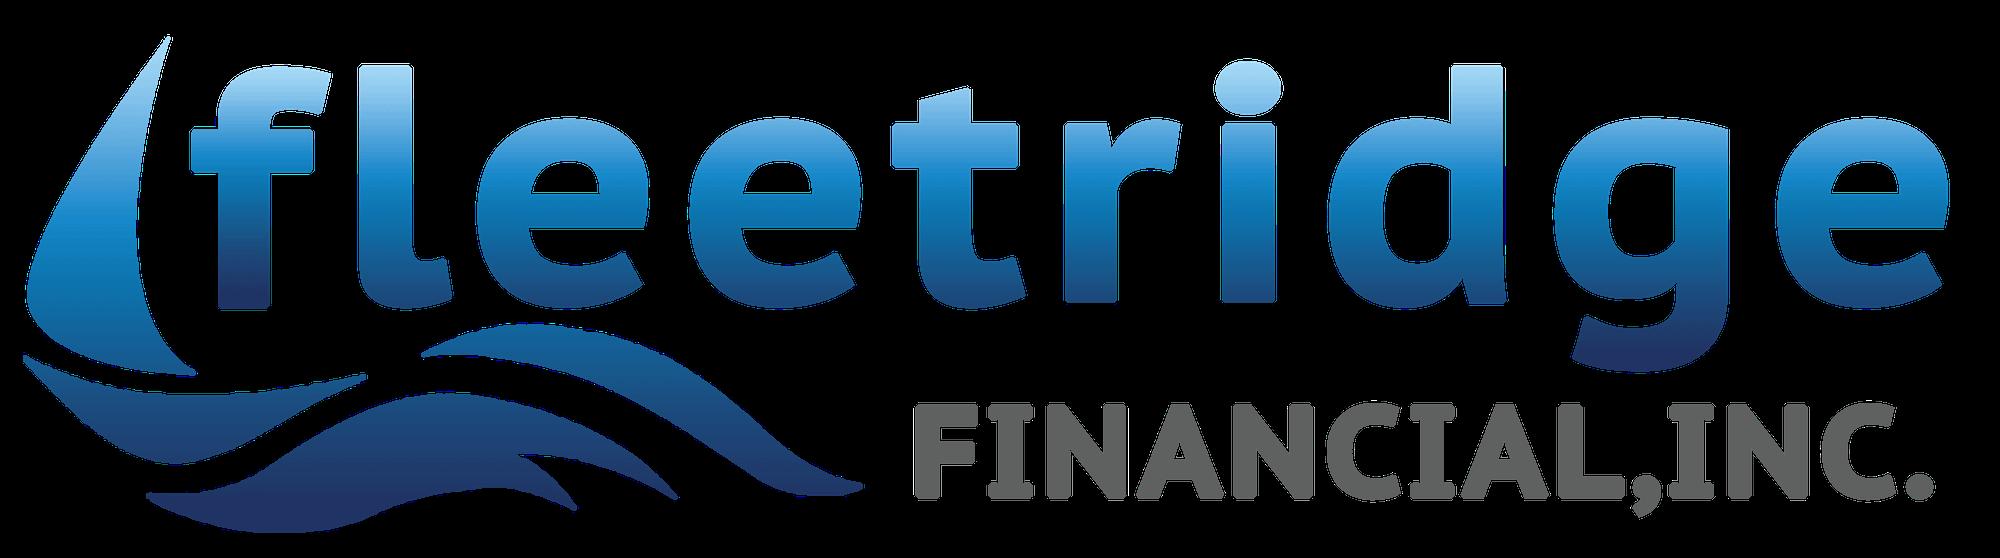 fleetridge financial